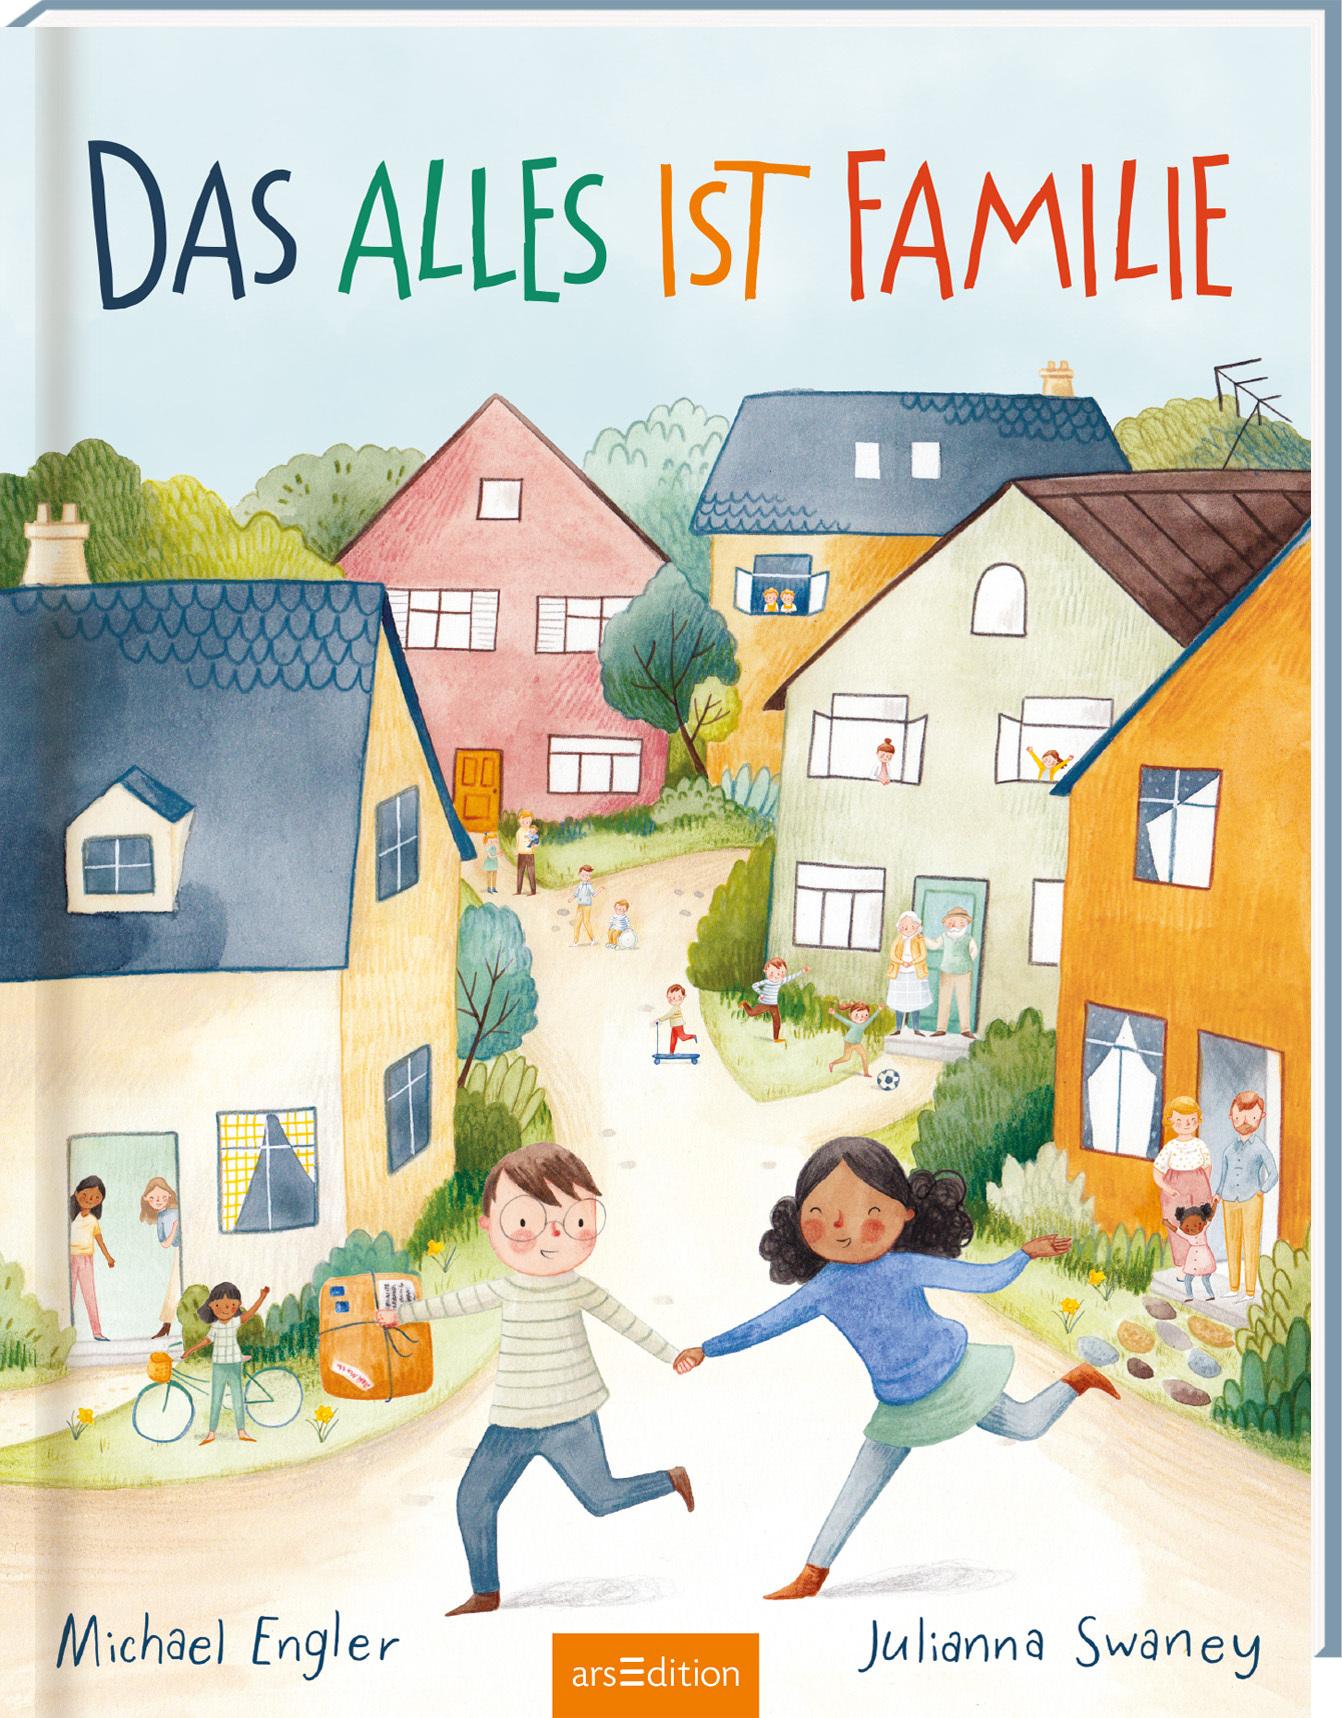 »DAS ALLES IST FAMILIE!« - ARS EDITION